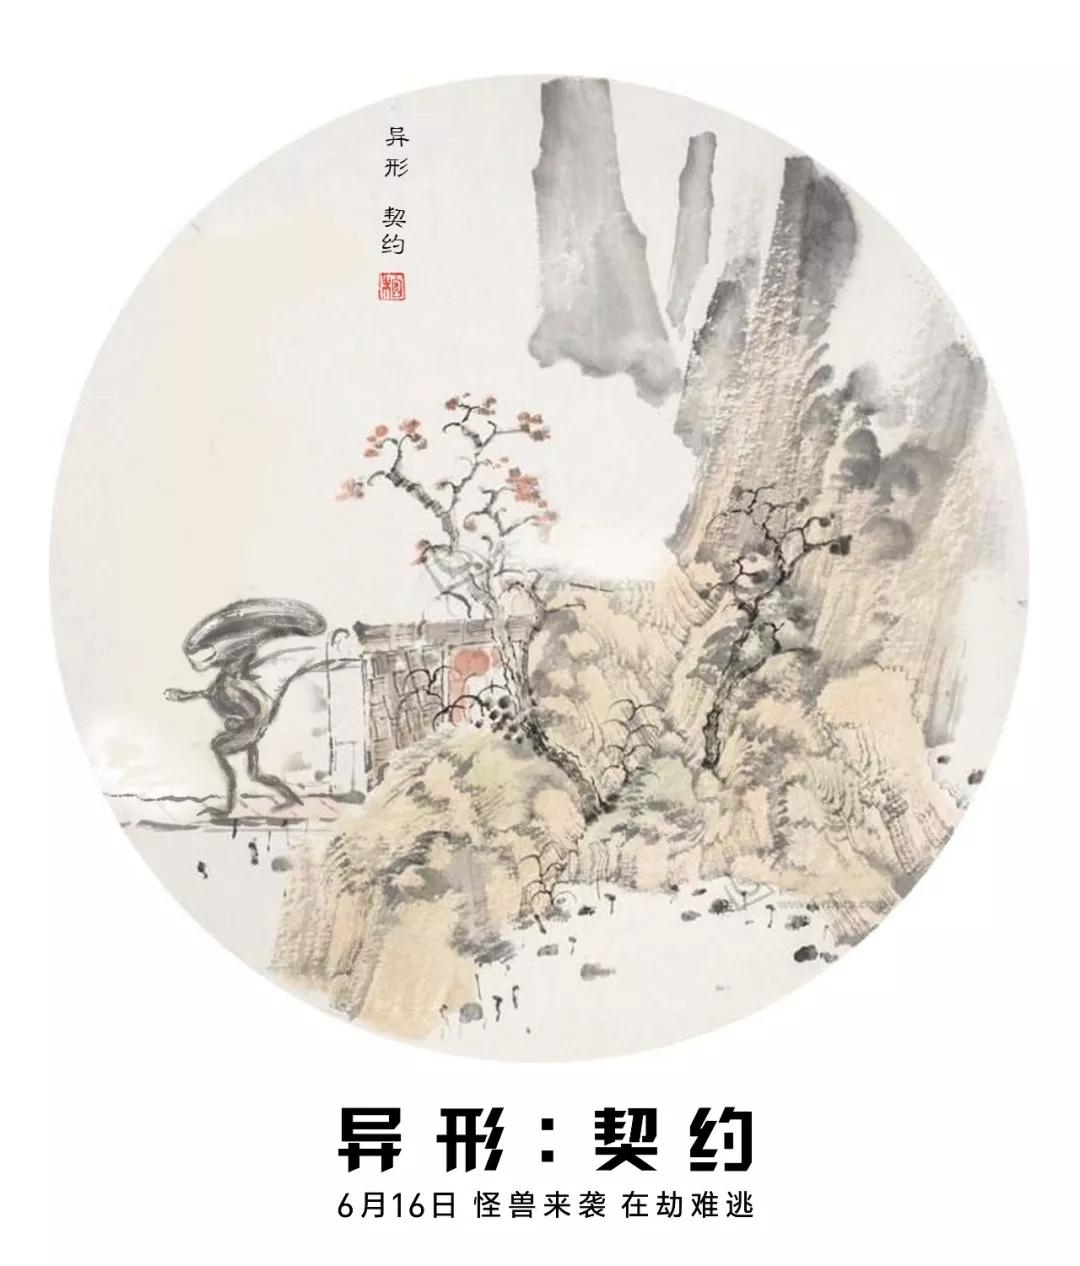 BBC中国风海报设计美哭了!还有更脑洞的.....